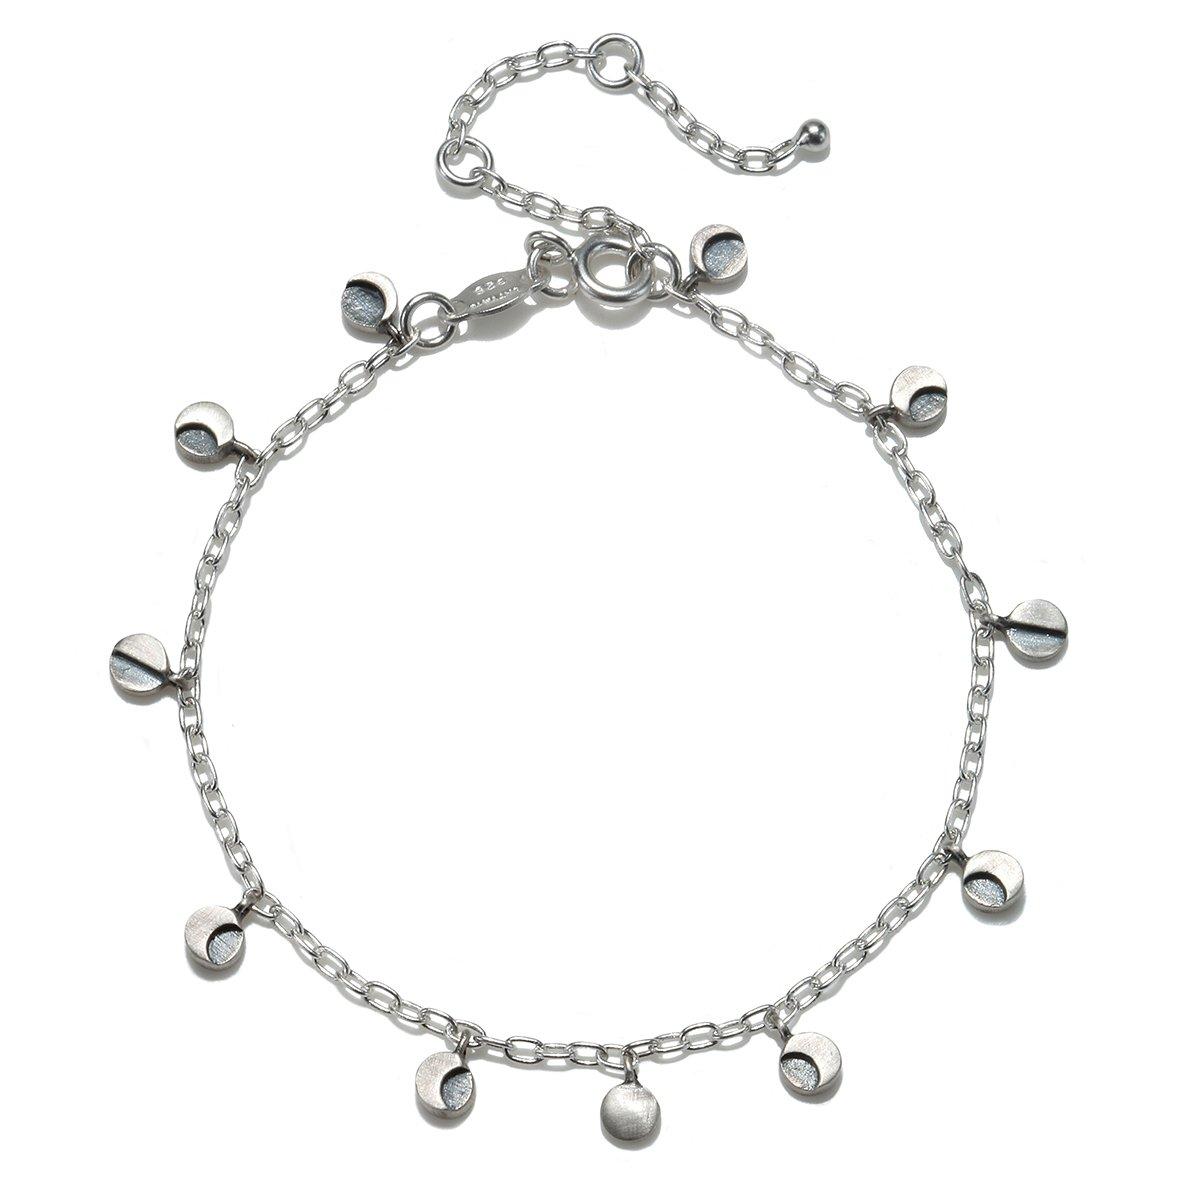 Satya Jewelry Sterling Silver Moon Phase Charm Bracelet